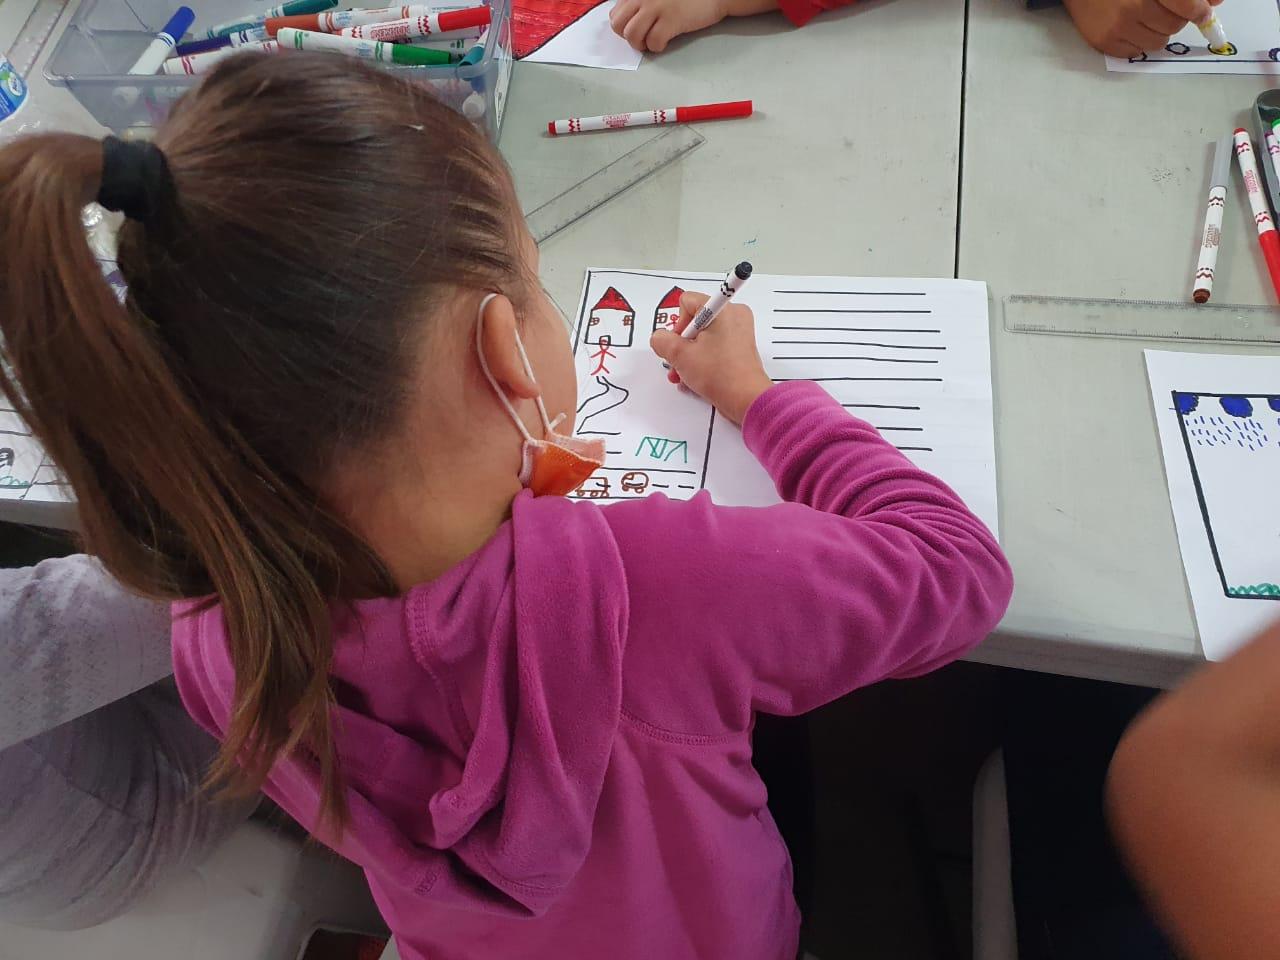 ¿Qué le ofrece México a las niñas?